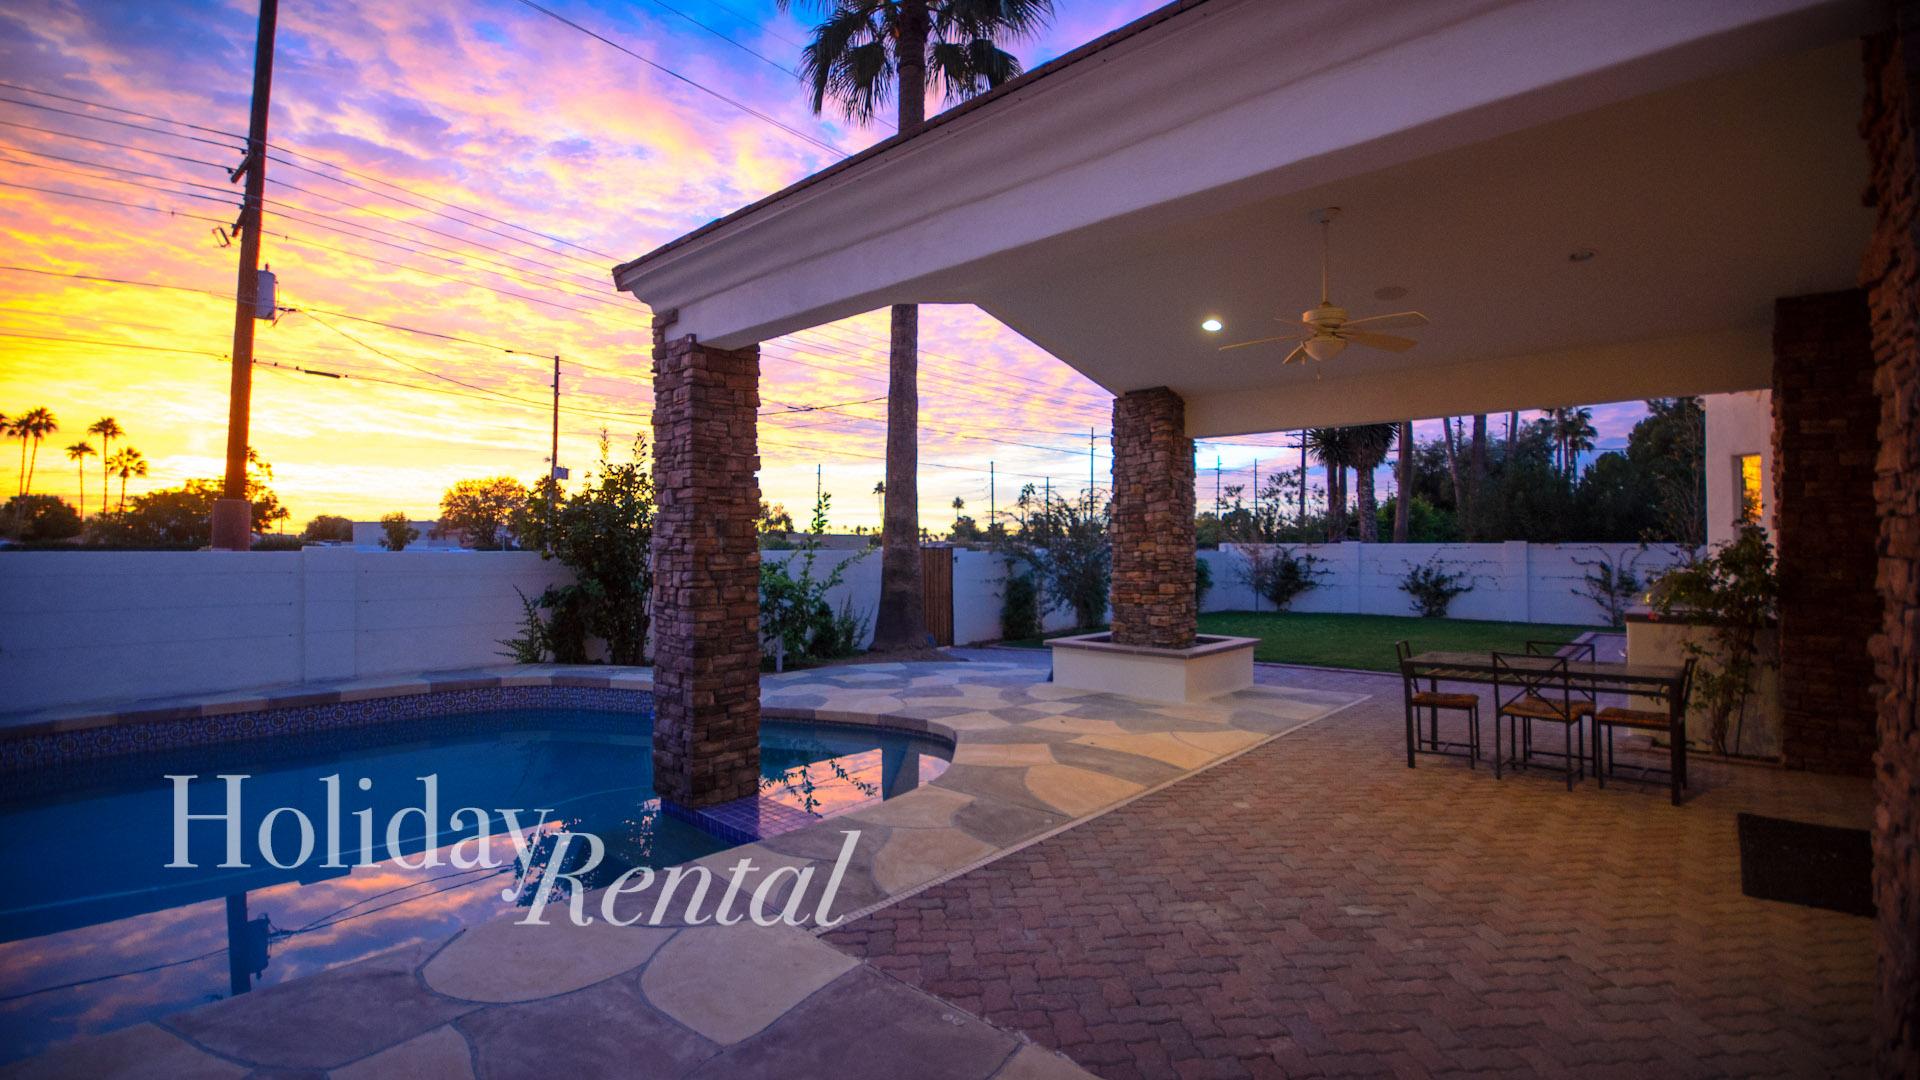 5 Bed Short Term Rental Villa scottsdale